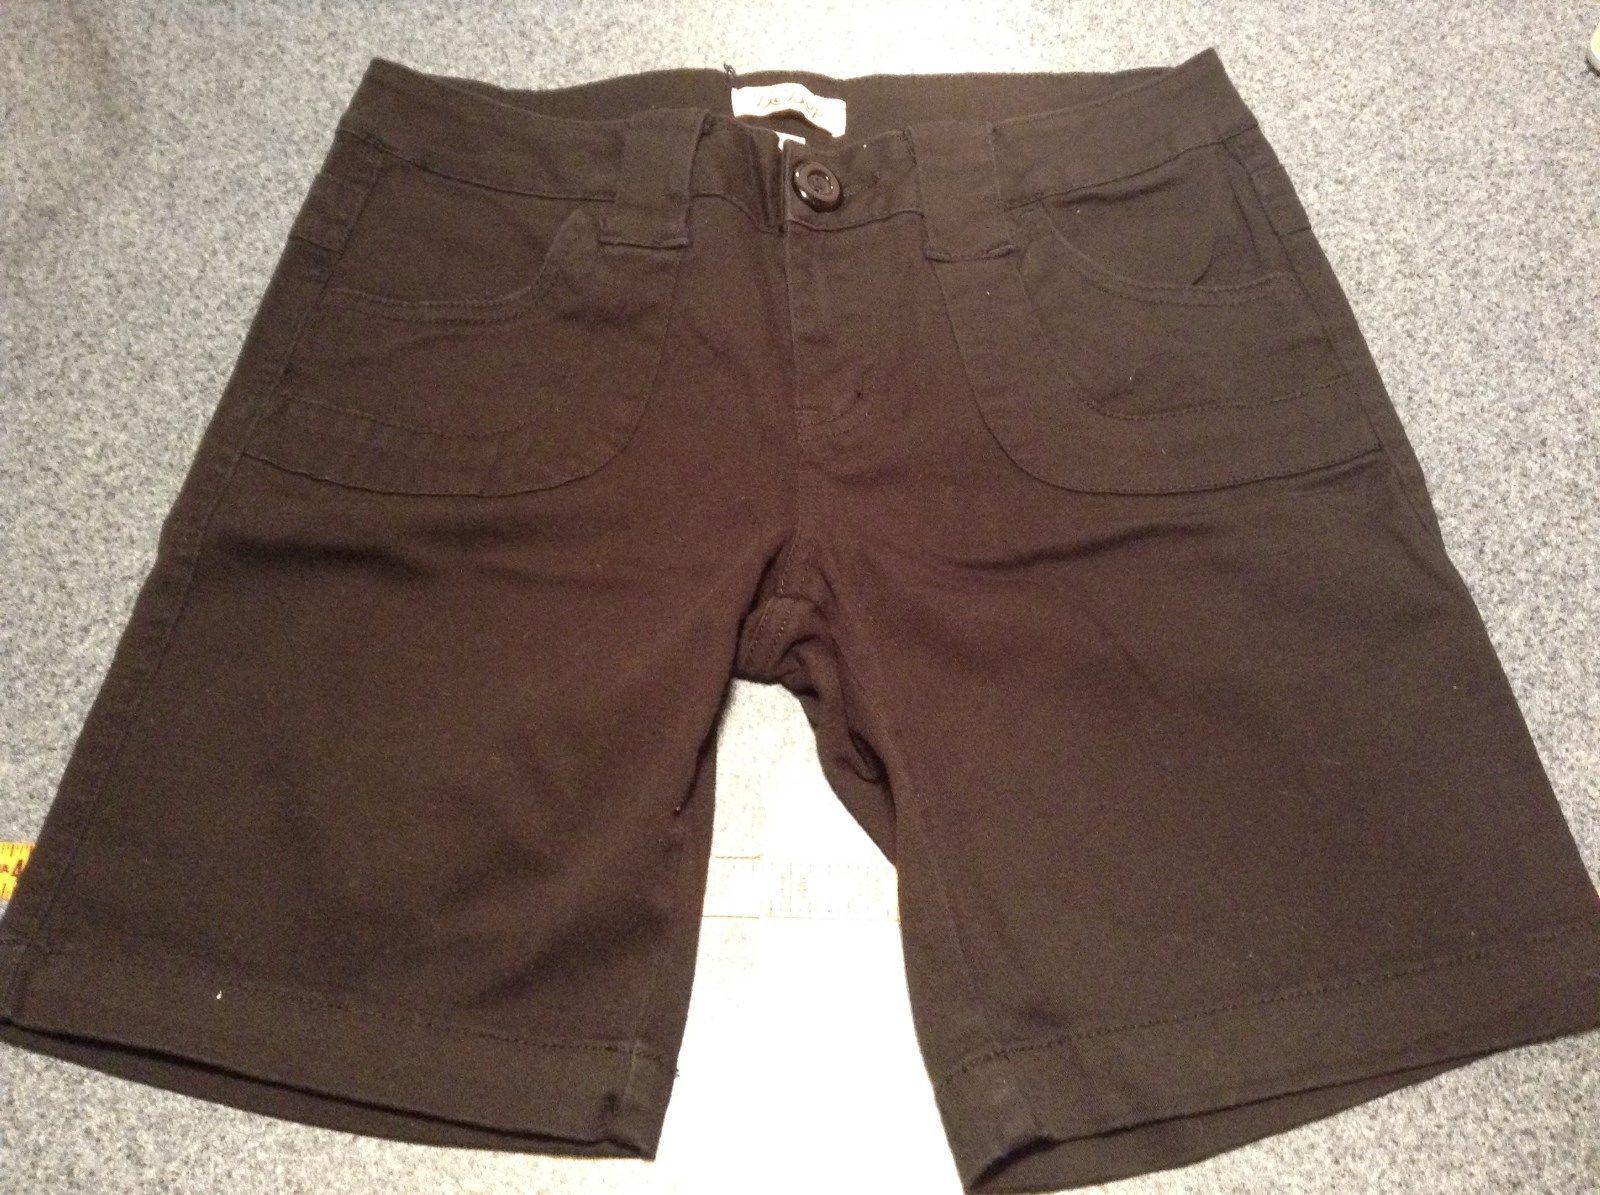 BeBop Black Shorts 98 Percent Cotton 2 Percent Spandex Size 7